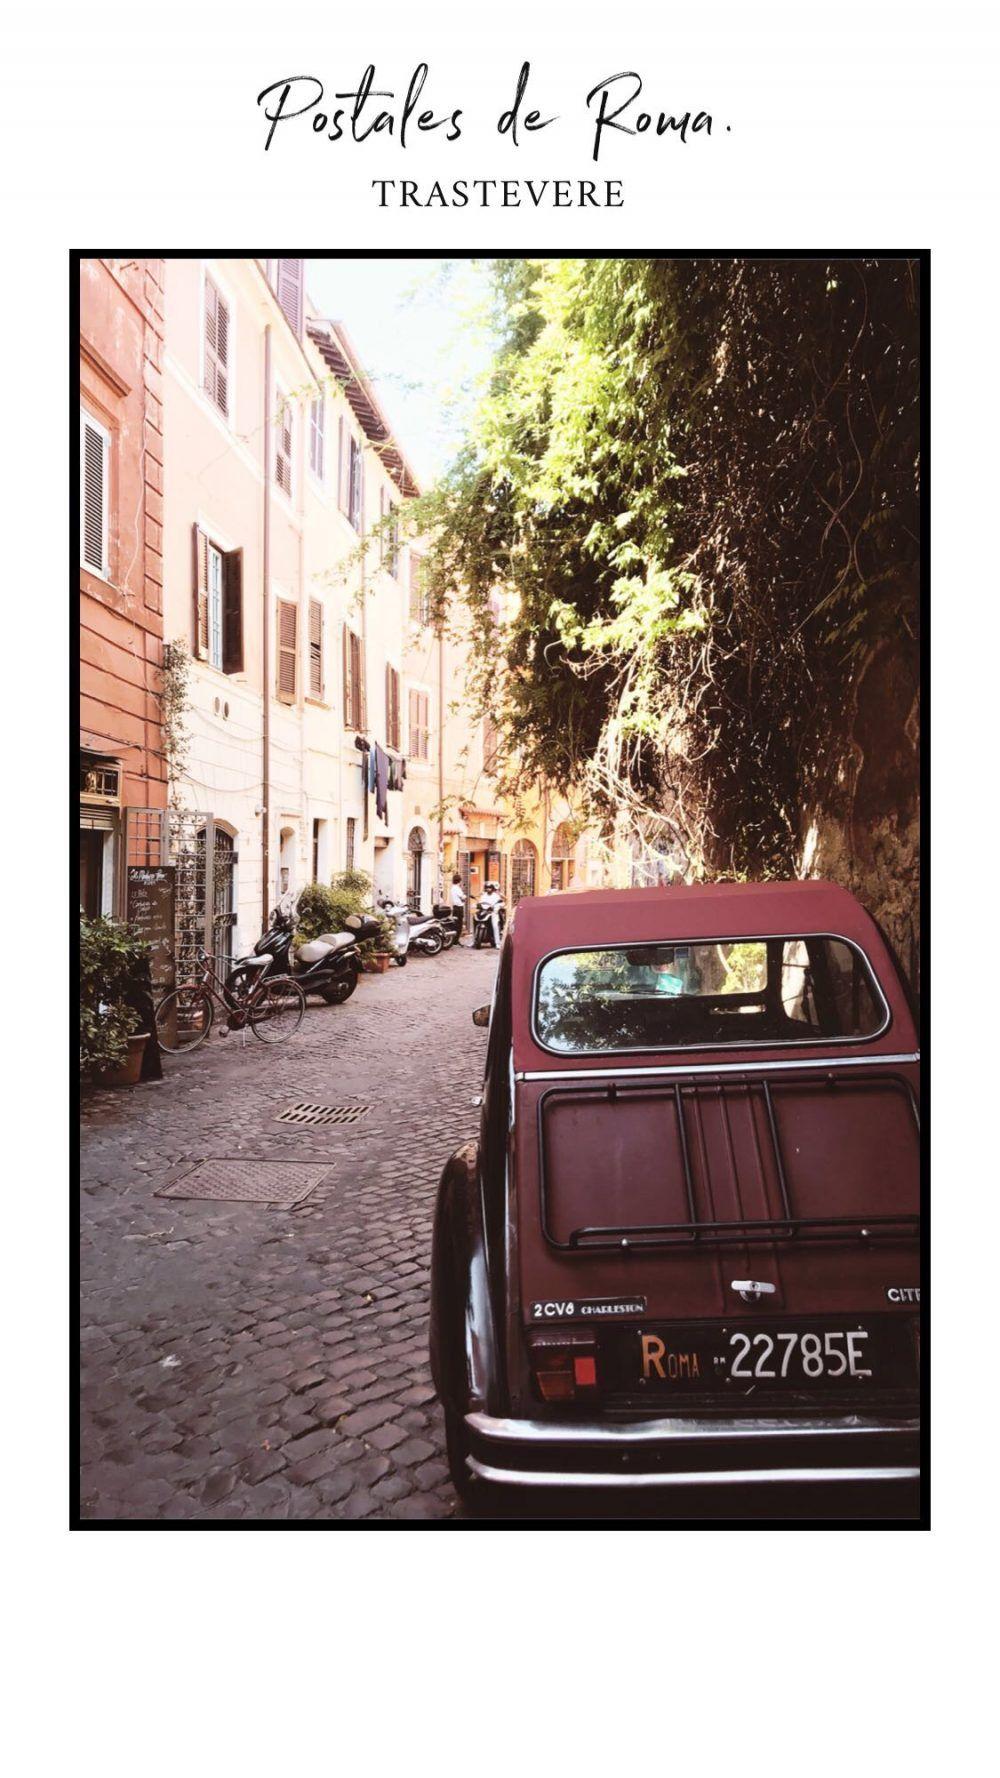 Roma, hadas y cuscus road trip18